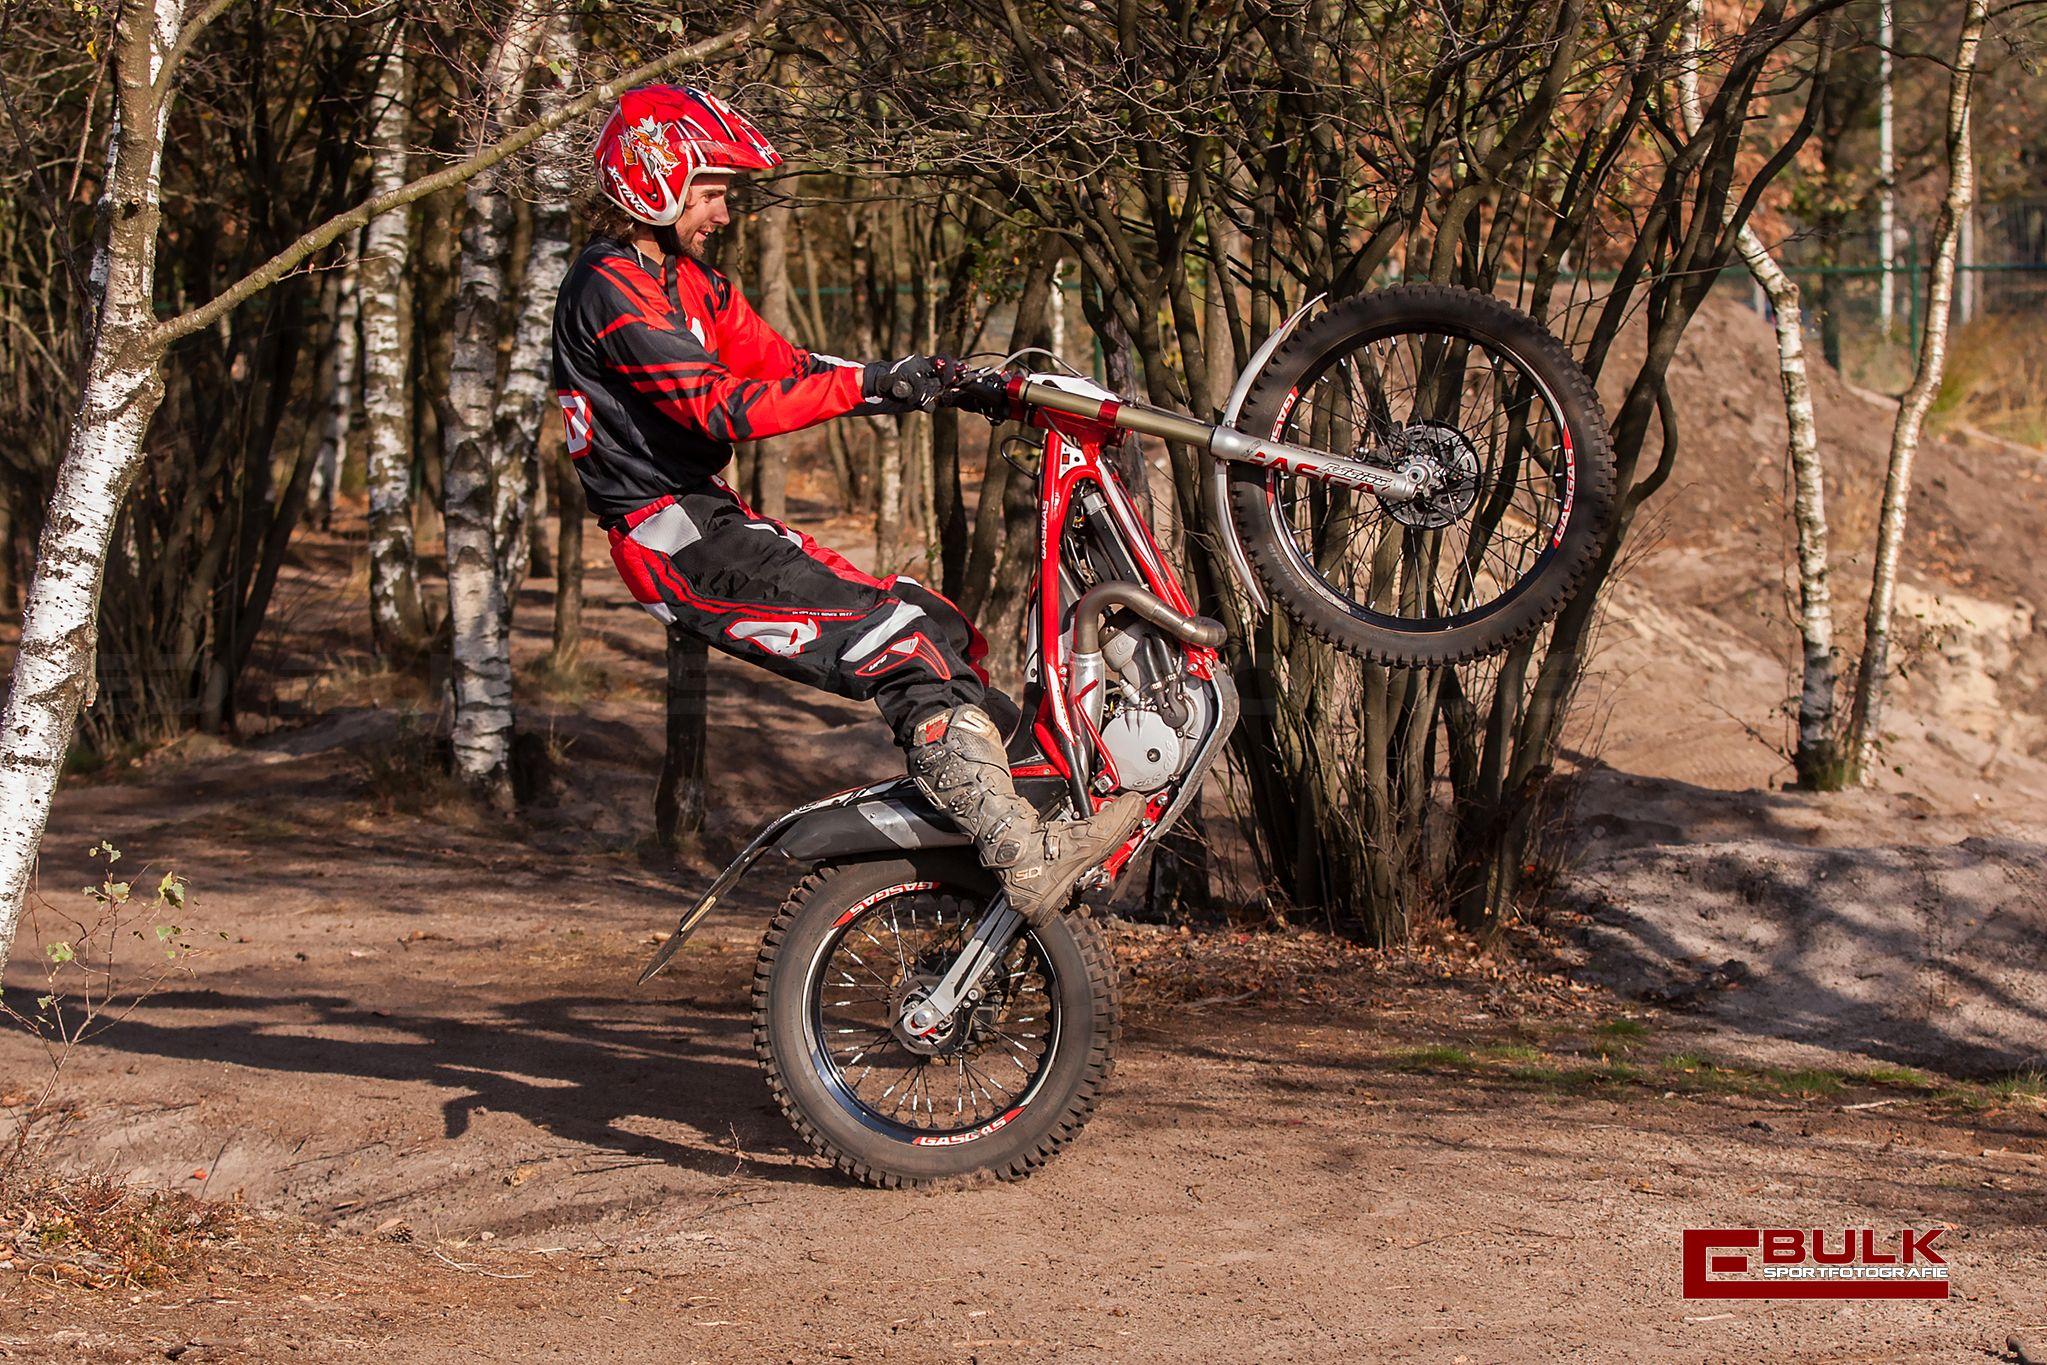 ebs_0925-ed_bulk_sportfotografie